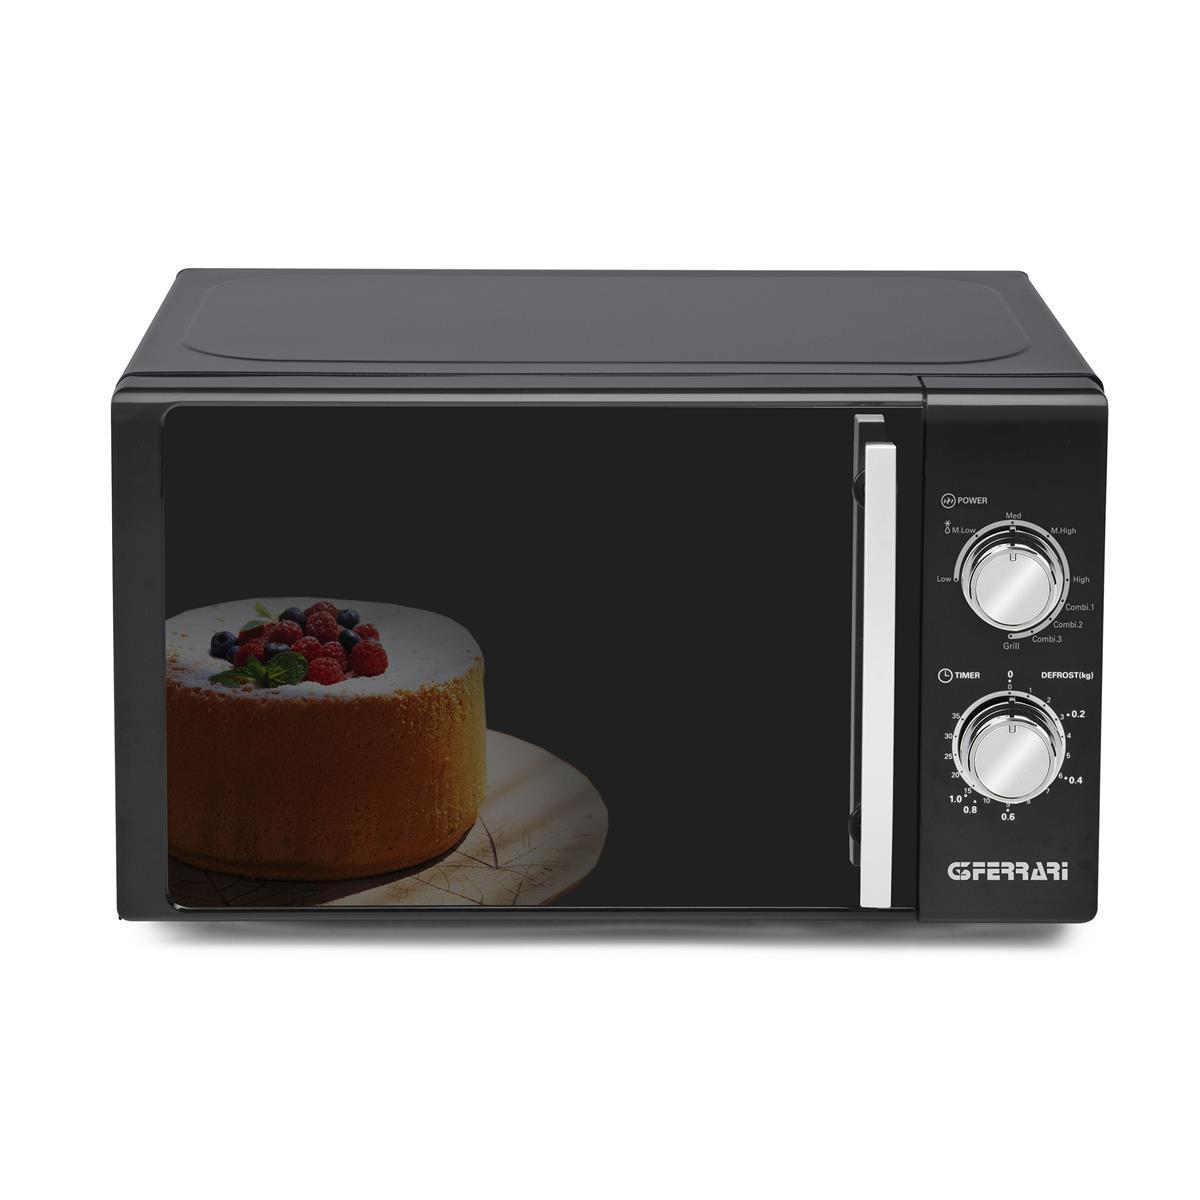 ALLBLACK - Combined Microwave Oven 20 Liters Black Mirror 700 + 1000 W